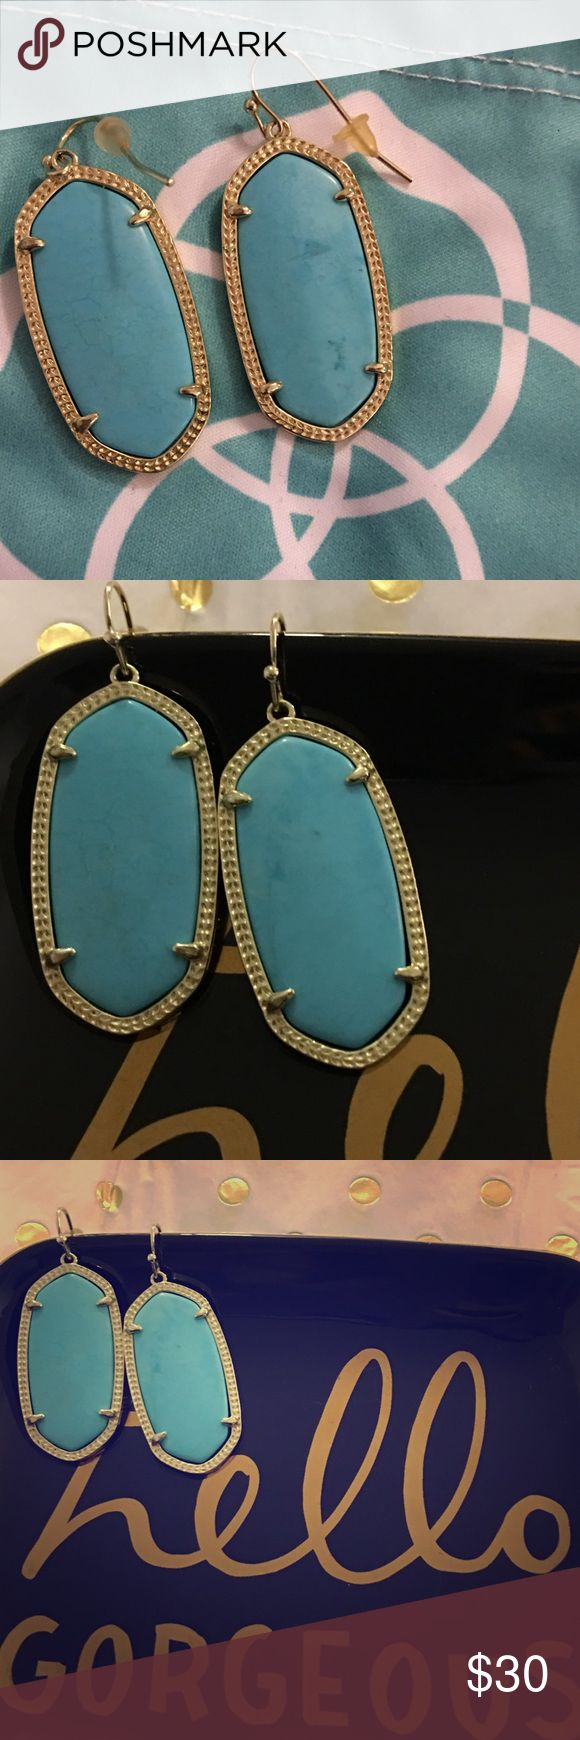 Kendra Scott Elle earrings in turquoise Relisting these earrings since the last sale did not go through. Cute elle earrings always kept in dust bag. Used a few times, in good condition. Price is firm. Kendra Scott Jewelry Earrings